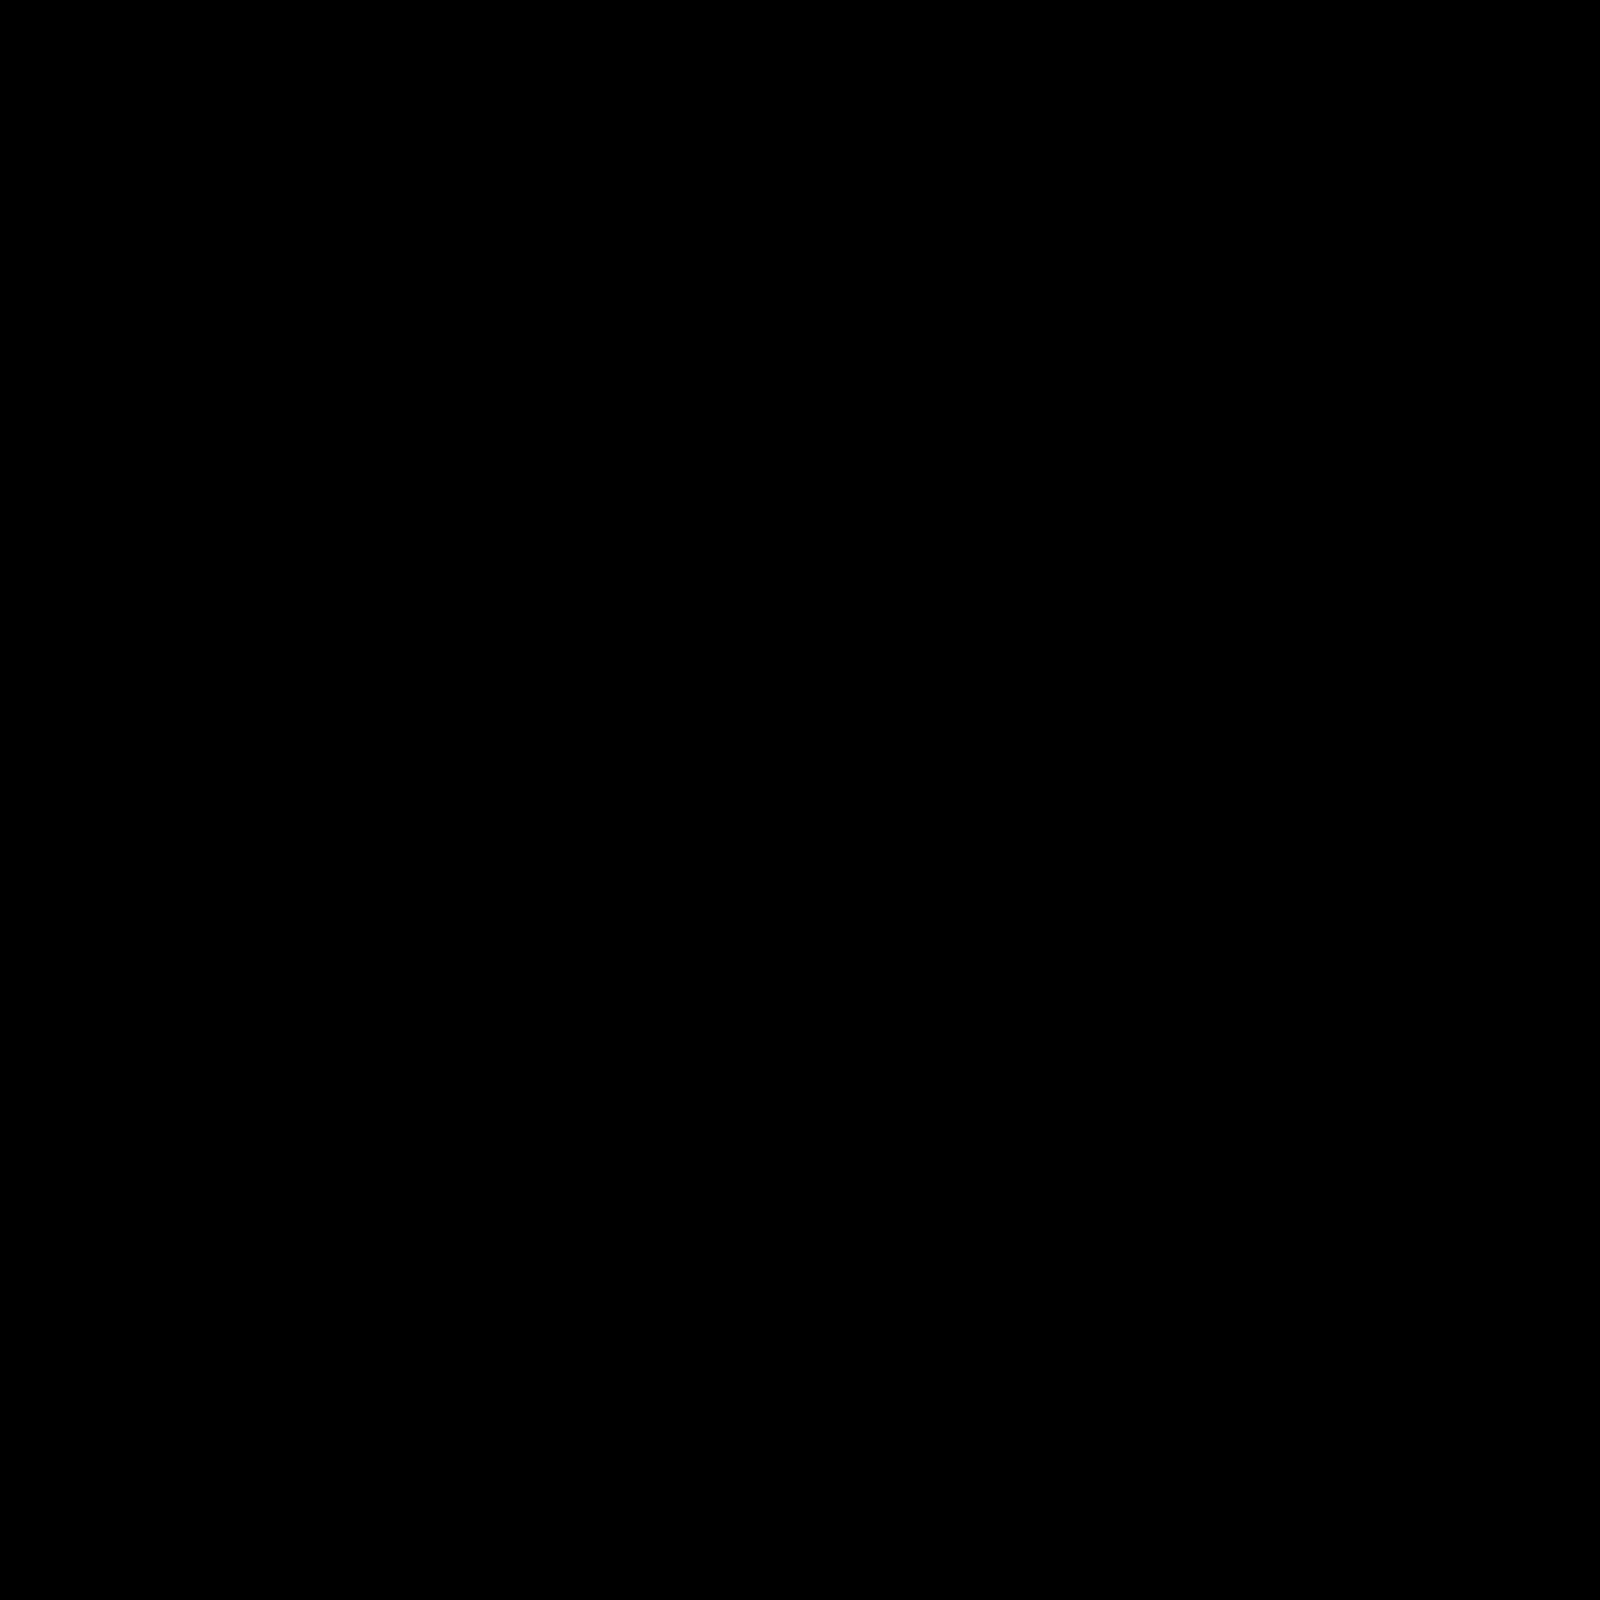 1600x1600 Checked Checkbox Icon